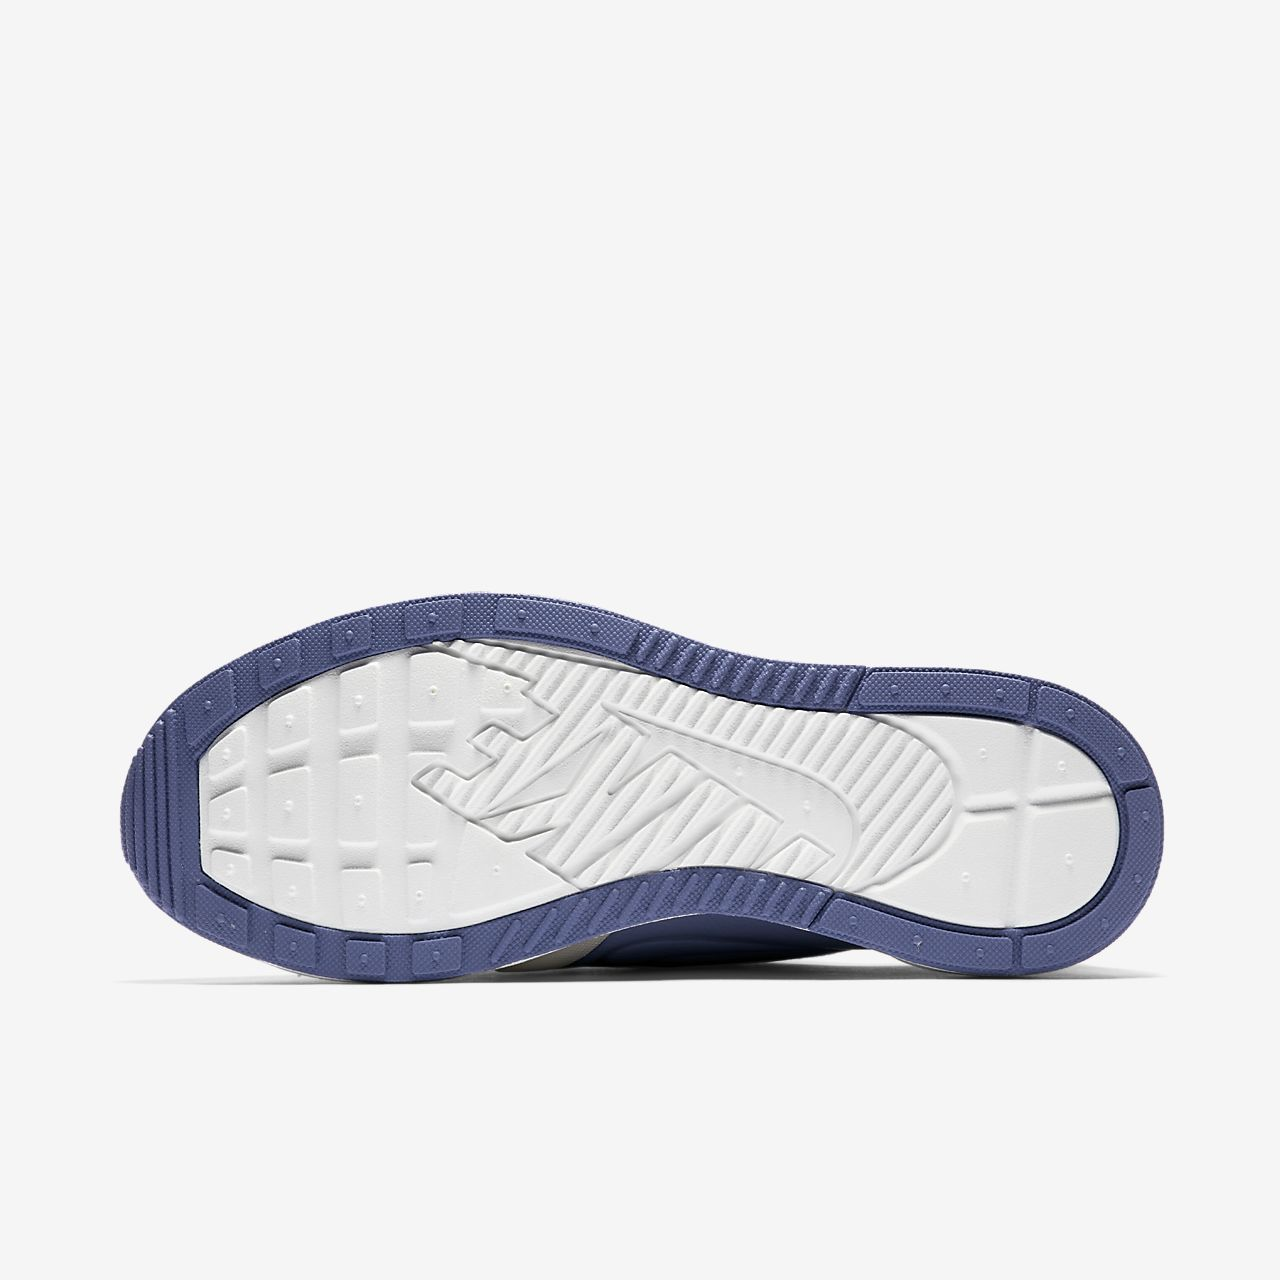 d01dc8813727c nike ashin modern lx shoes for sale